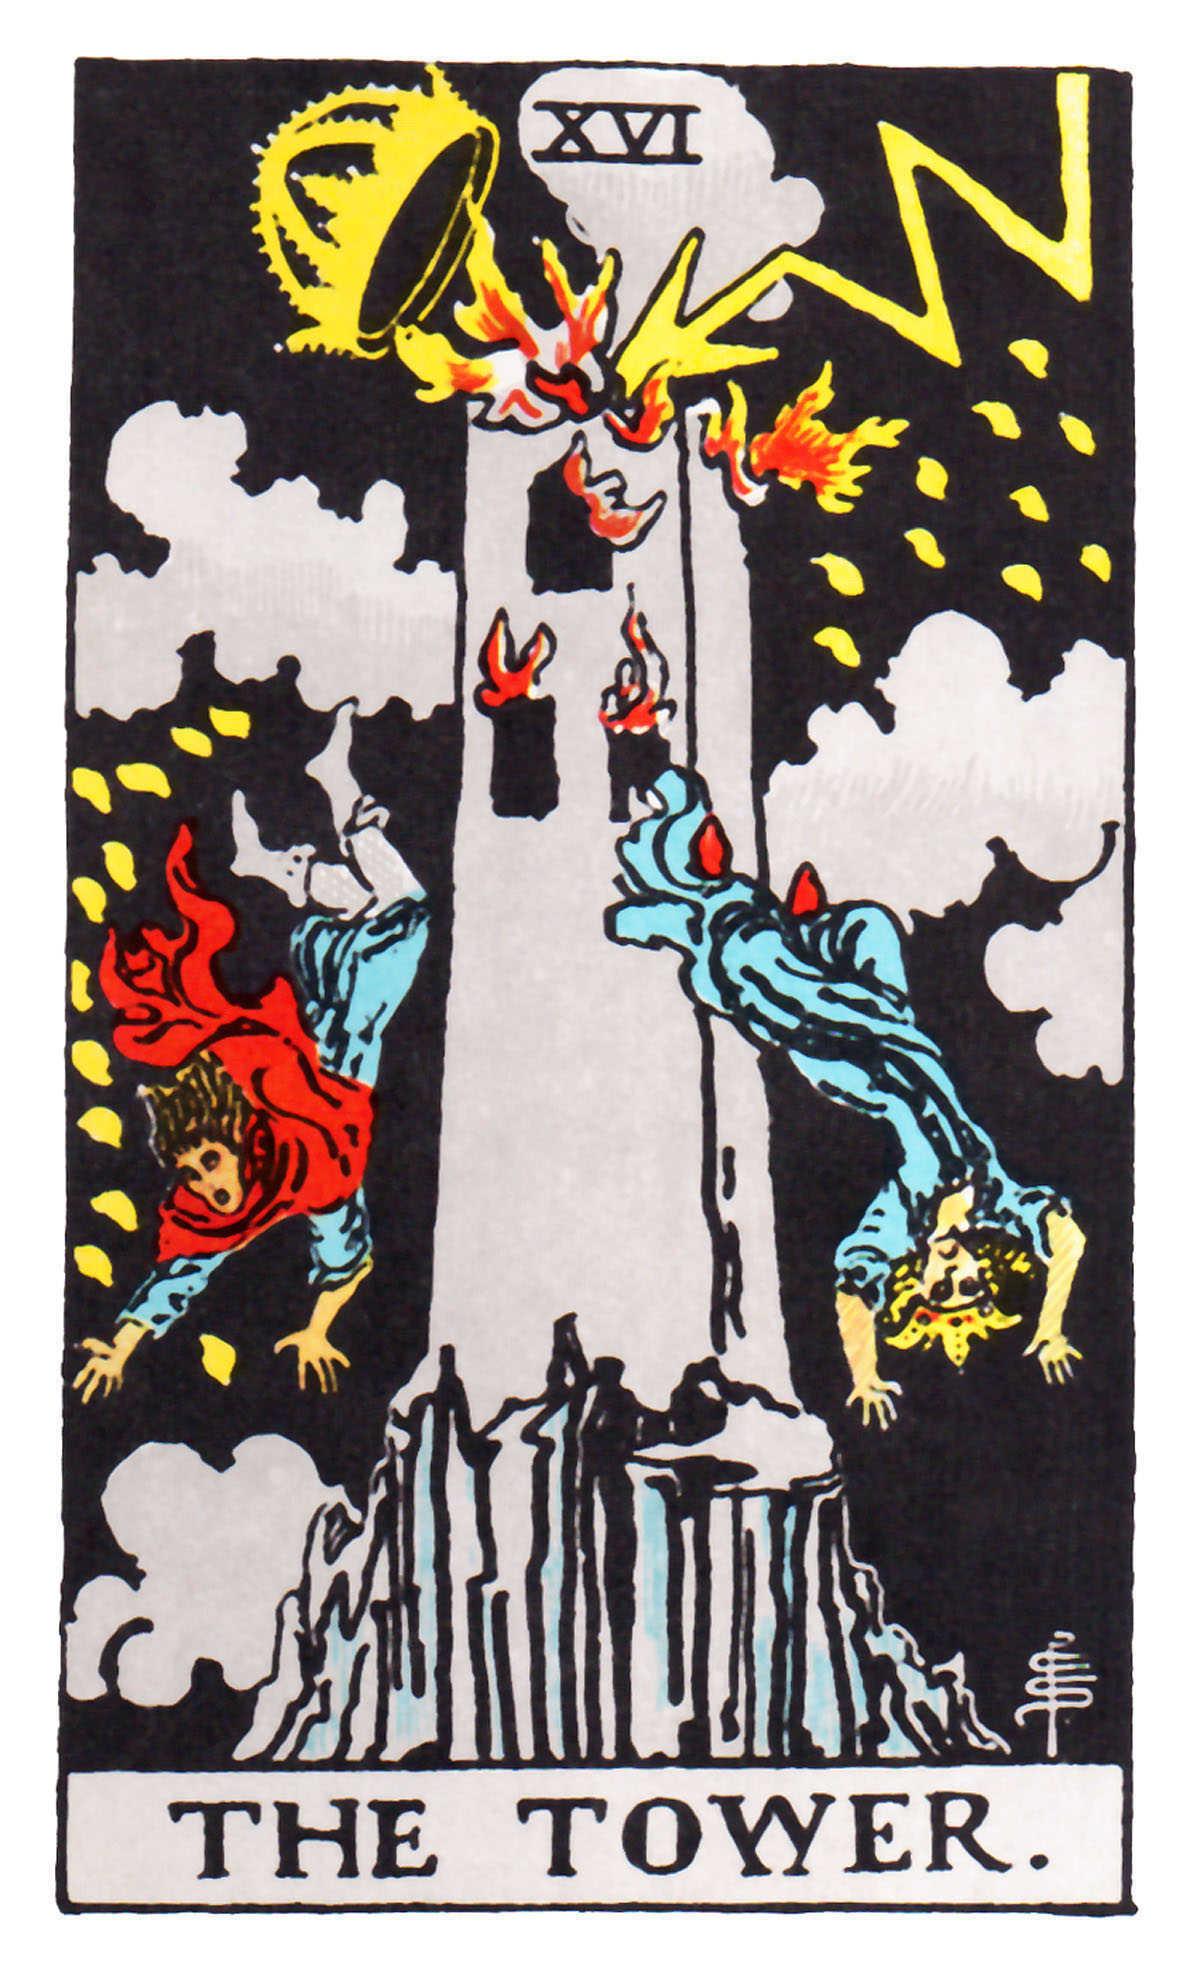 The Tower - XVI - 16 Tarot card